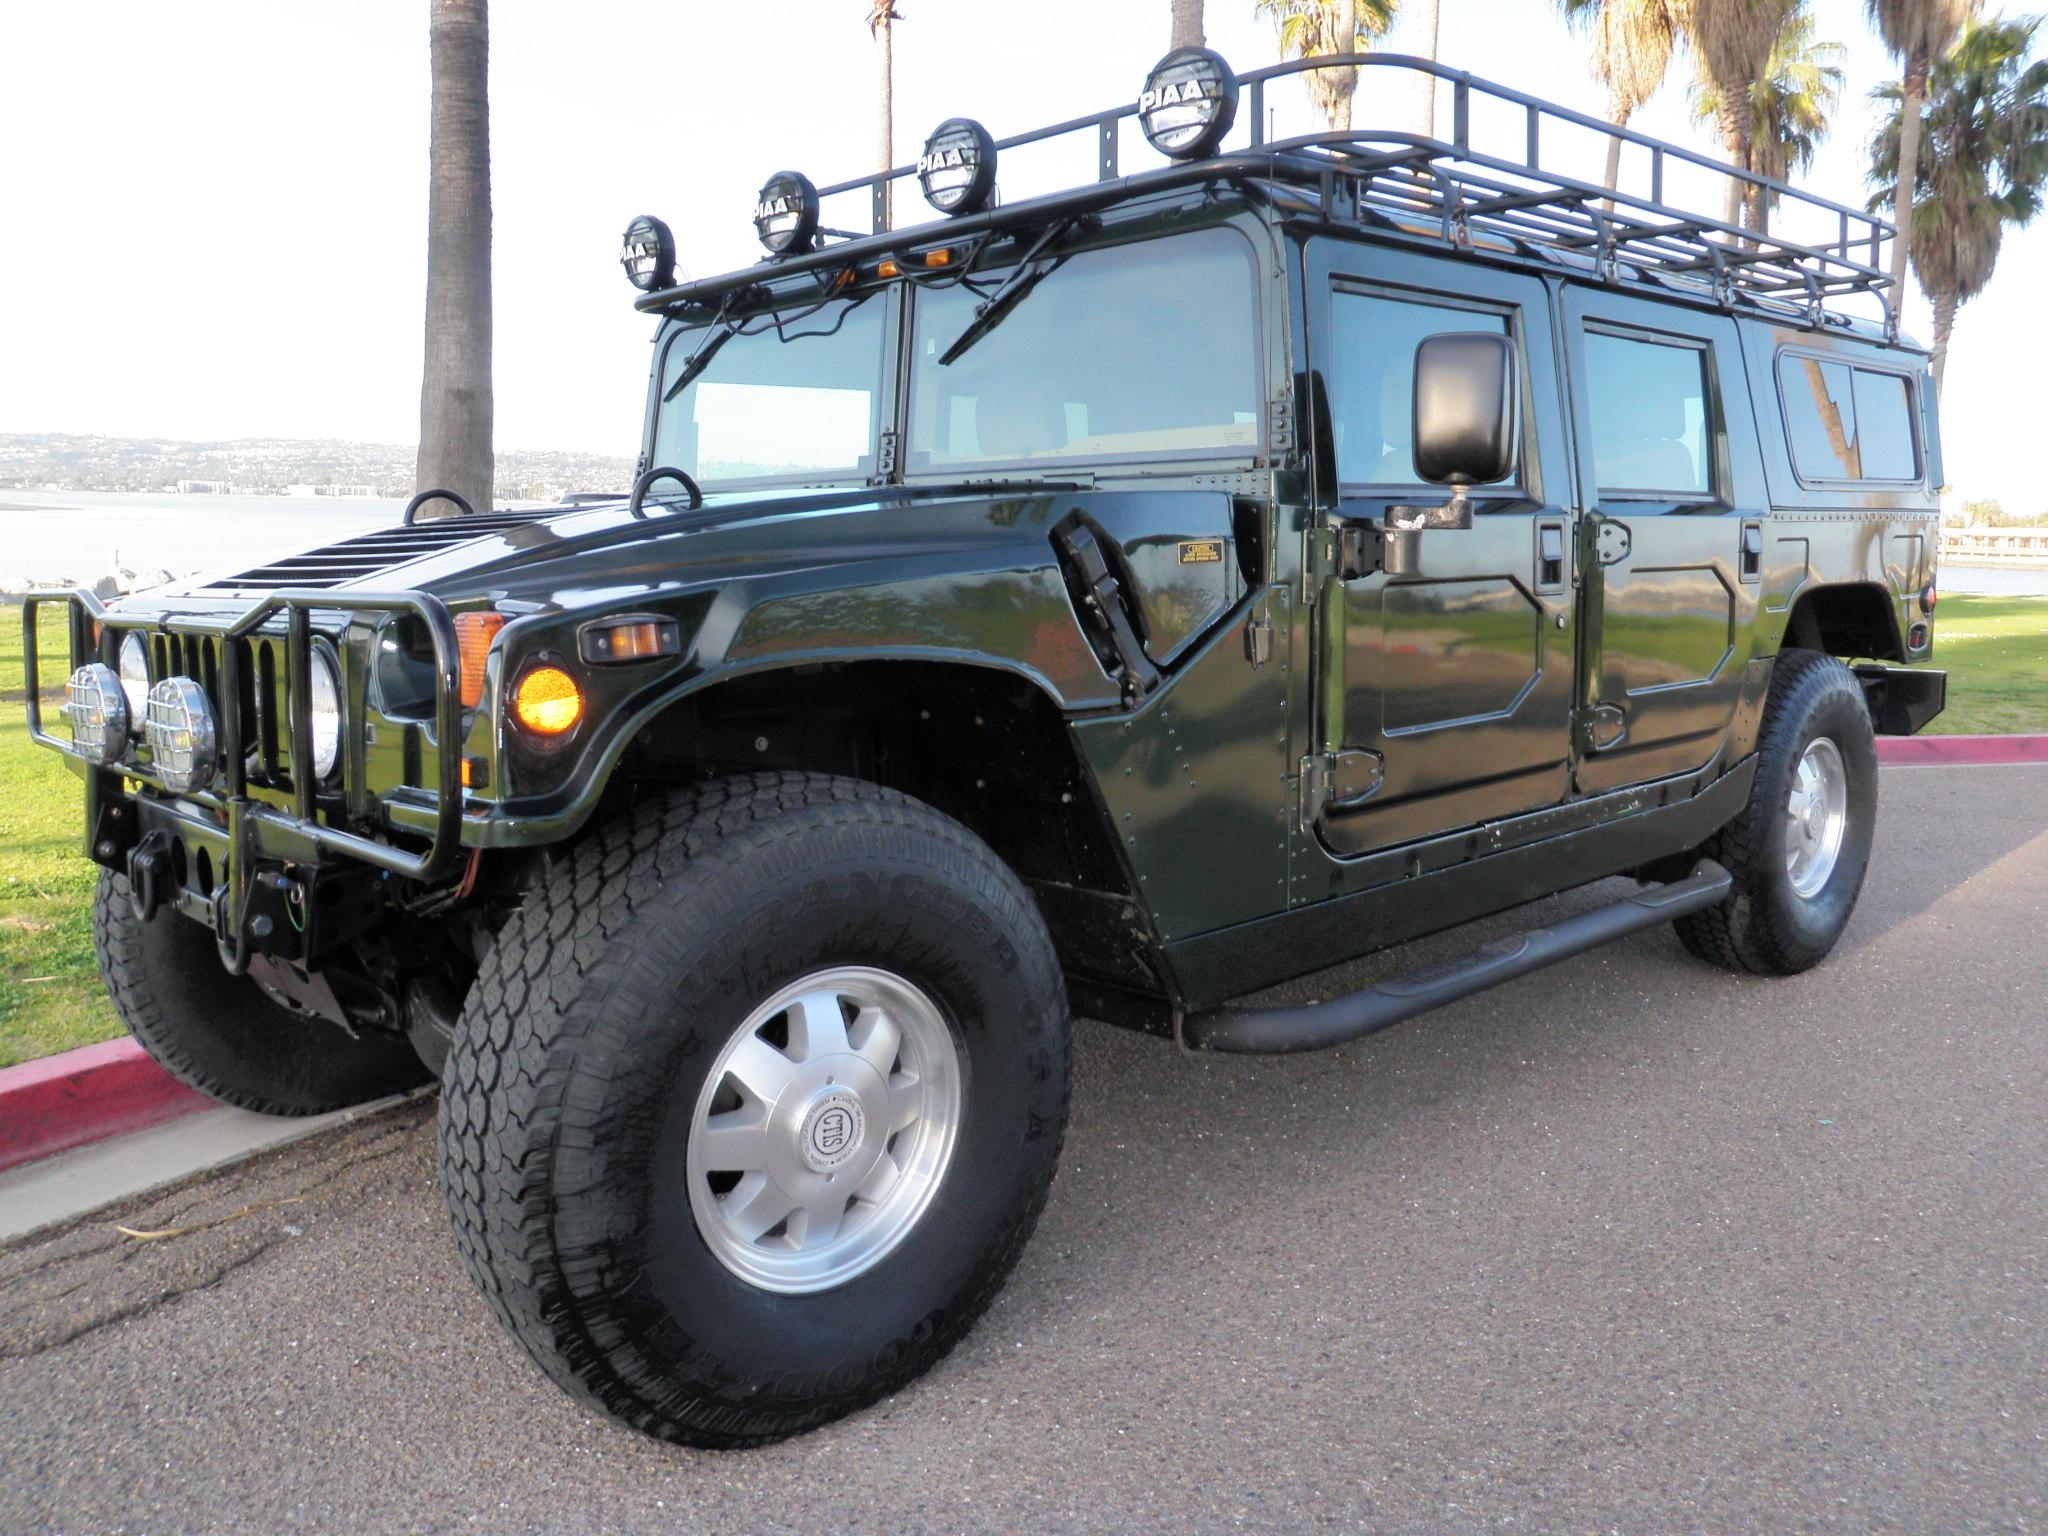 2000 Hummer H1 Wagon 20k miles loaded …sold